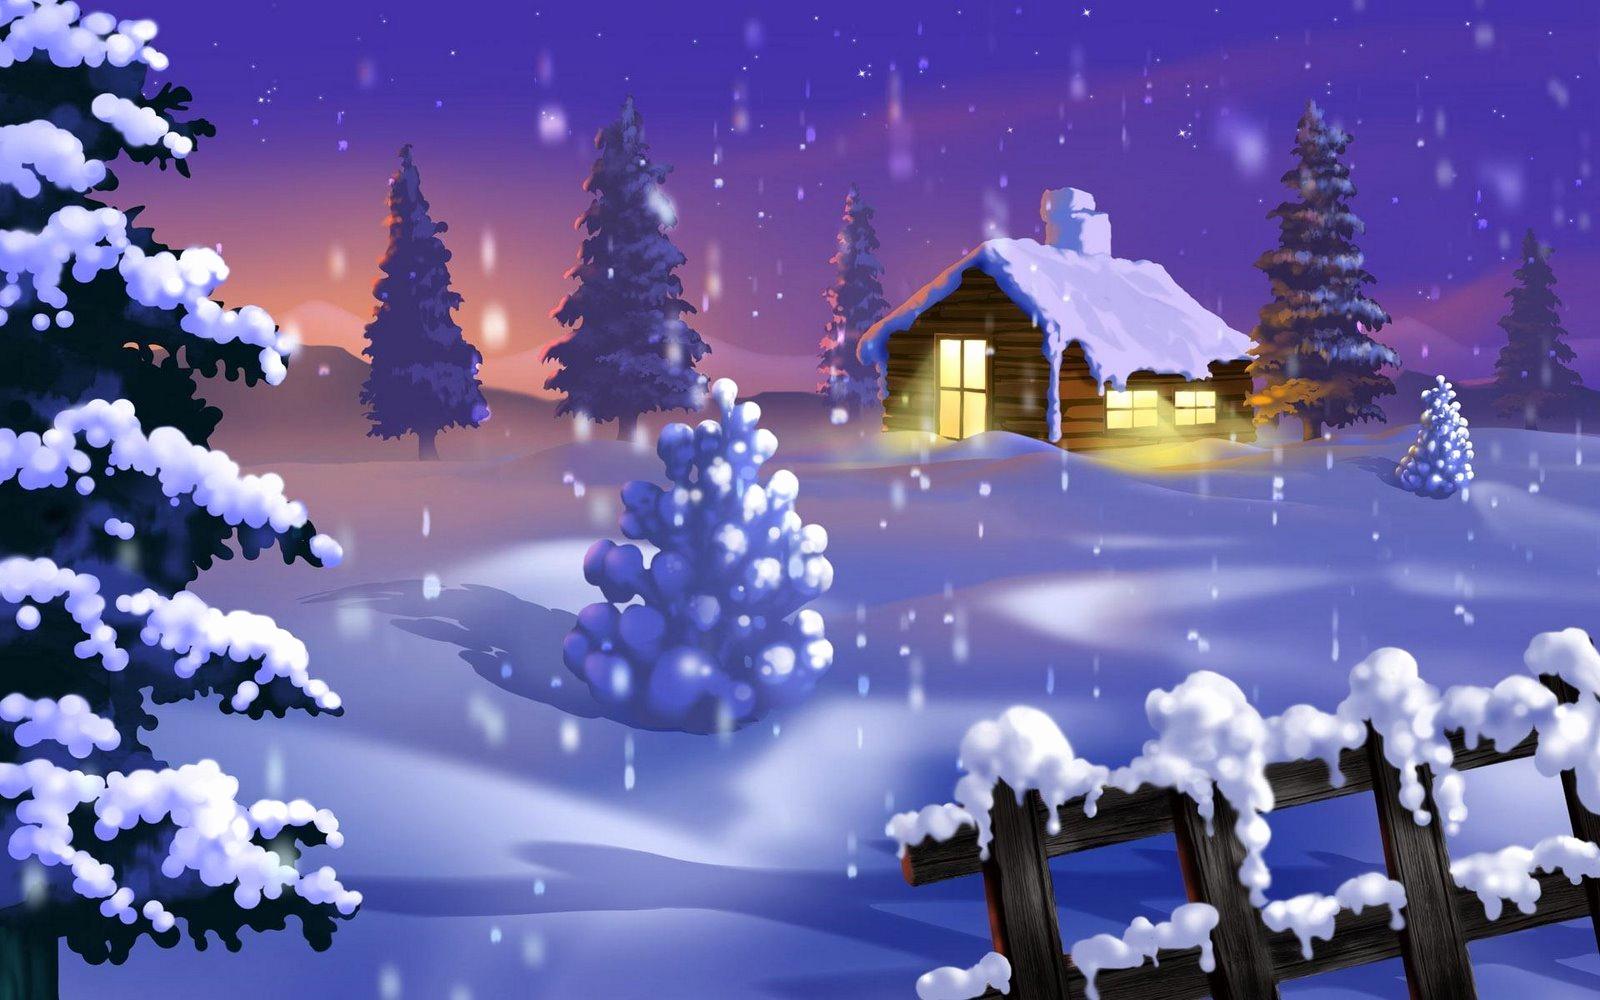 Free Christmas Desktop Wallpaper Beautiful Christmas Wallpaper Hd Puter Wallpaper